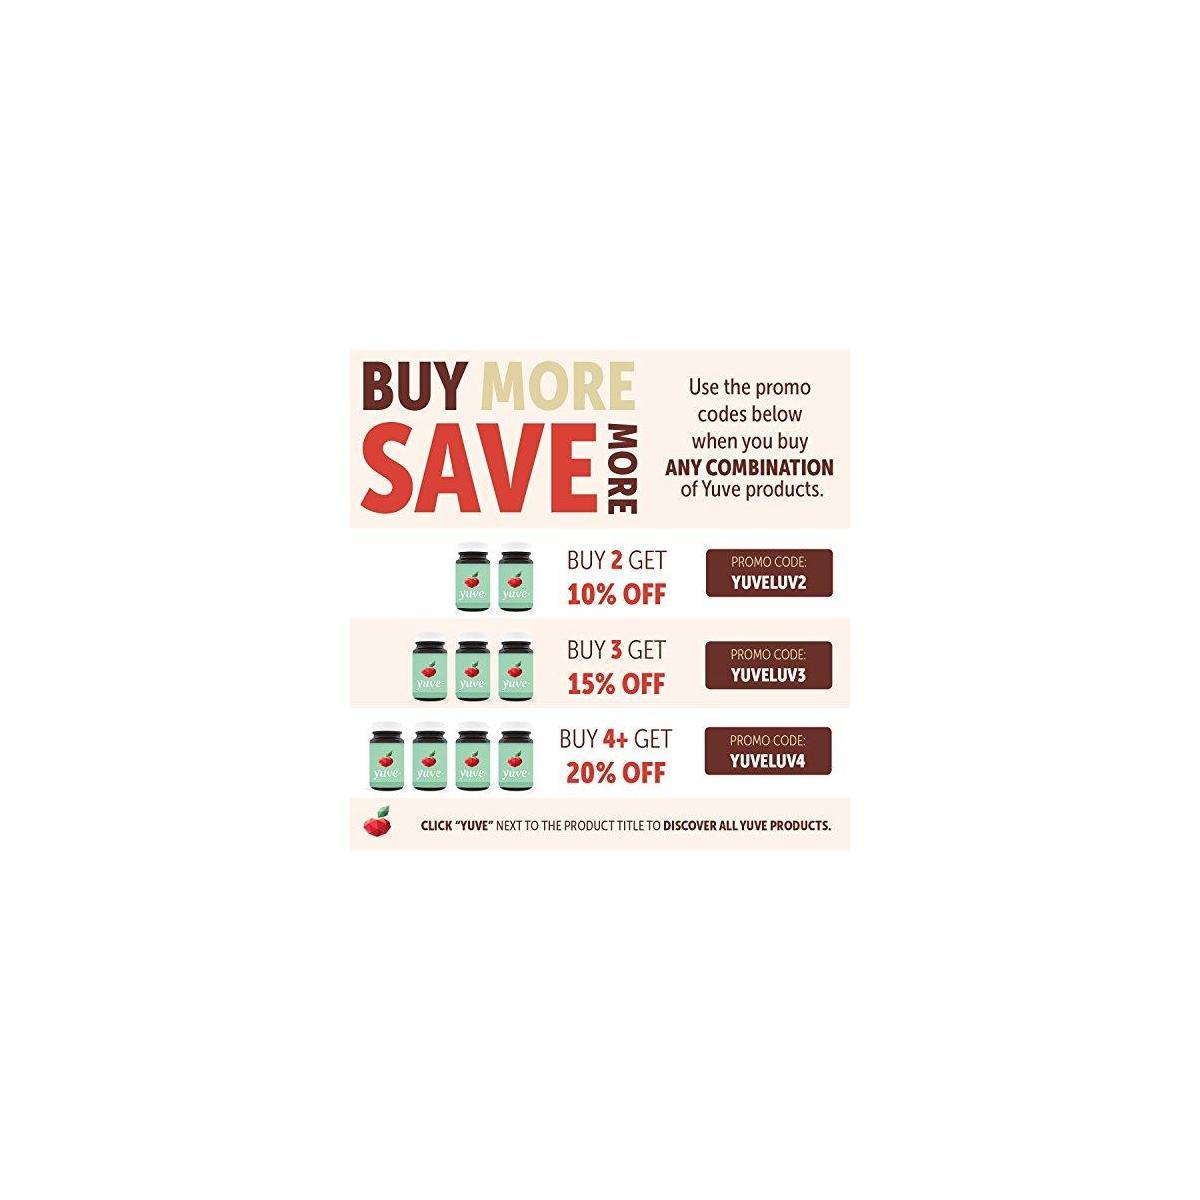 Yuve Mediterranean Olive Leaf Extract 750mg - 20% Non-GMO Oleuropein - Cardiovascular Health & Immune Support - Helps Rejuvanate Skin - Powerful Antioxidant - Vegan, Natural, Gluten-Free - 60 Capsules